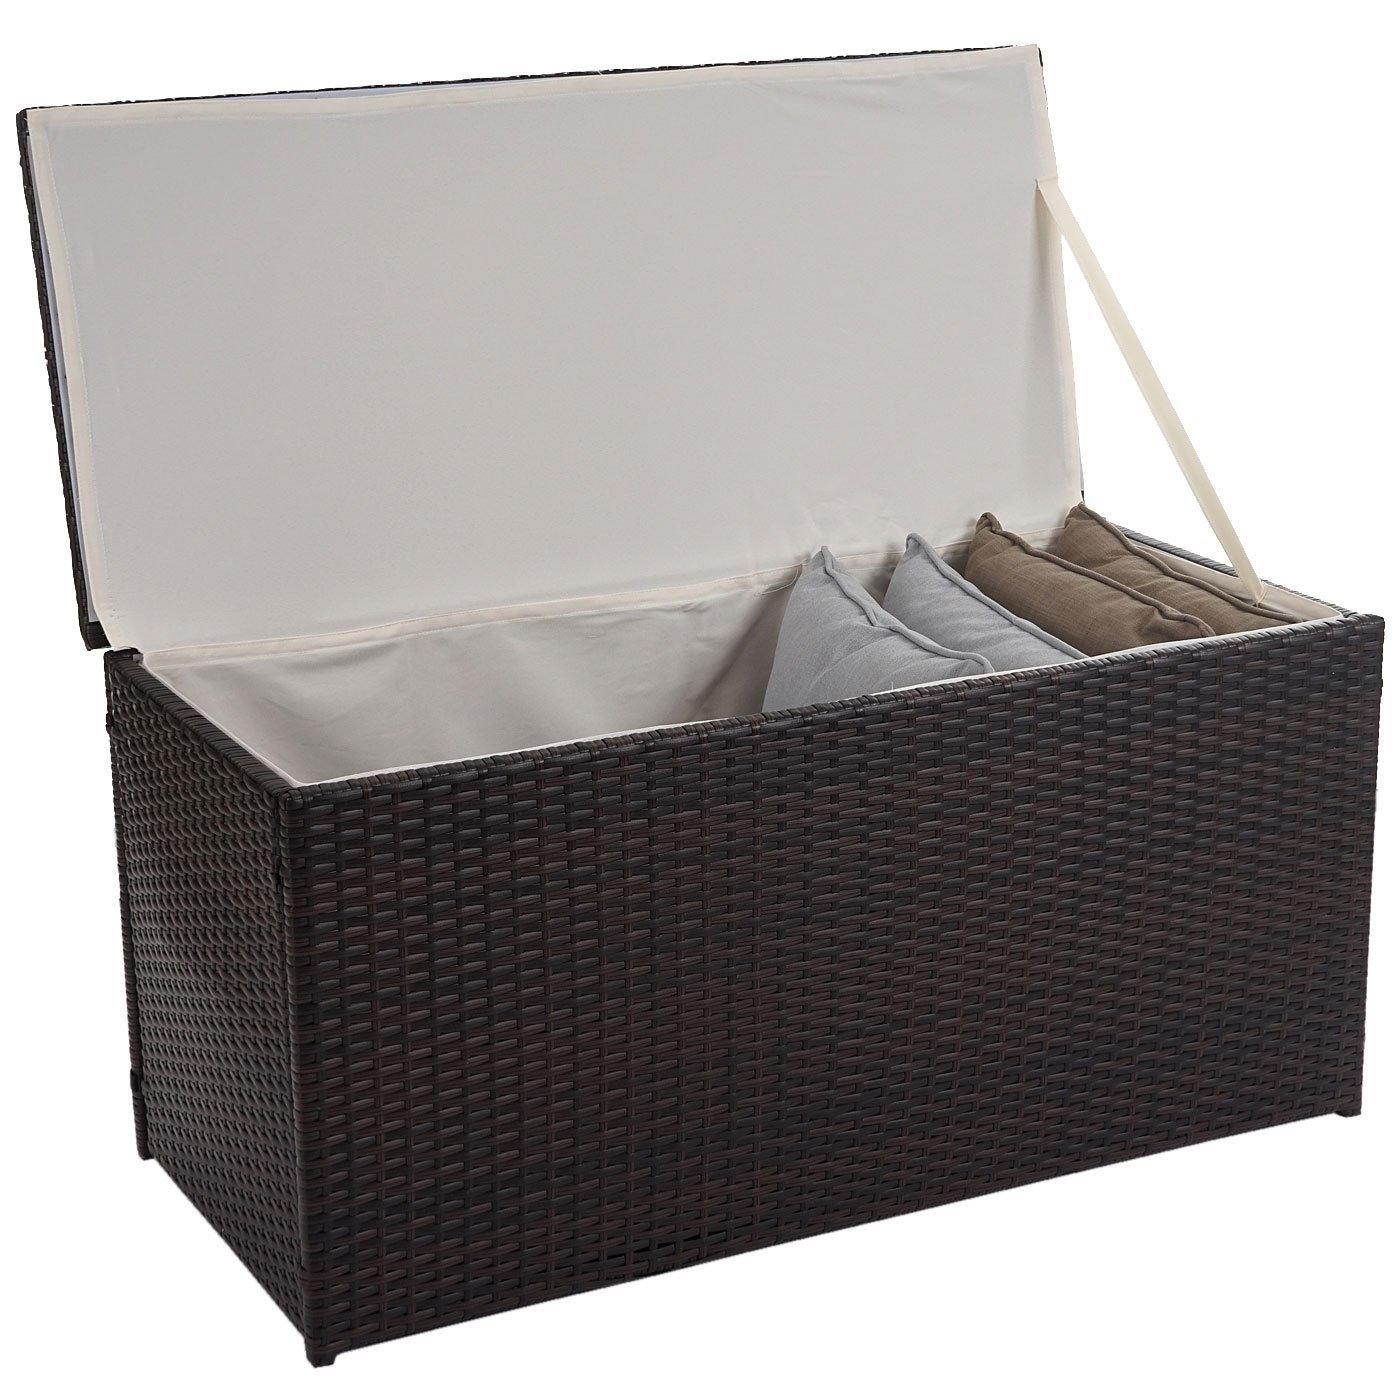 plastikbox mit deckel trendy classic with plastikbox mit deckel awesome big dean eurobox. Black Bedroom Furniture Sets. Home Design Ideas